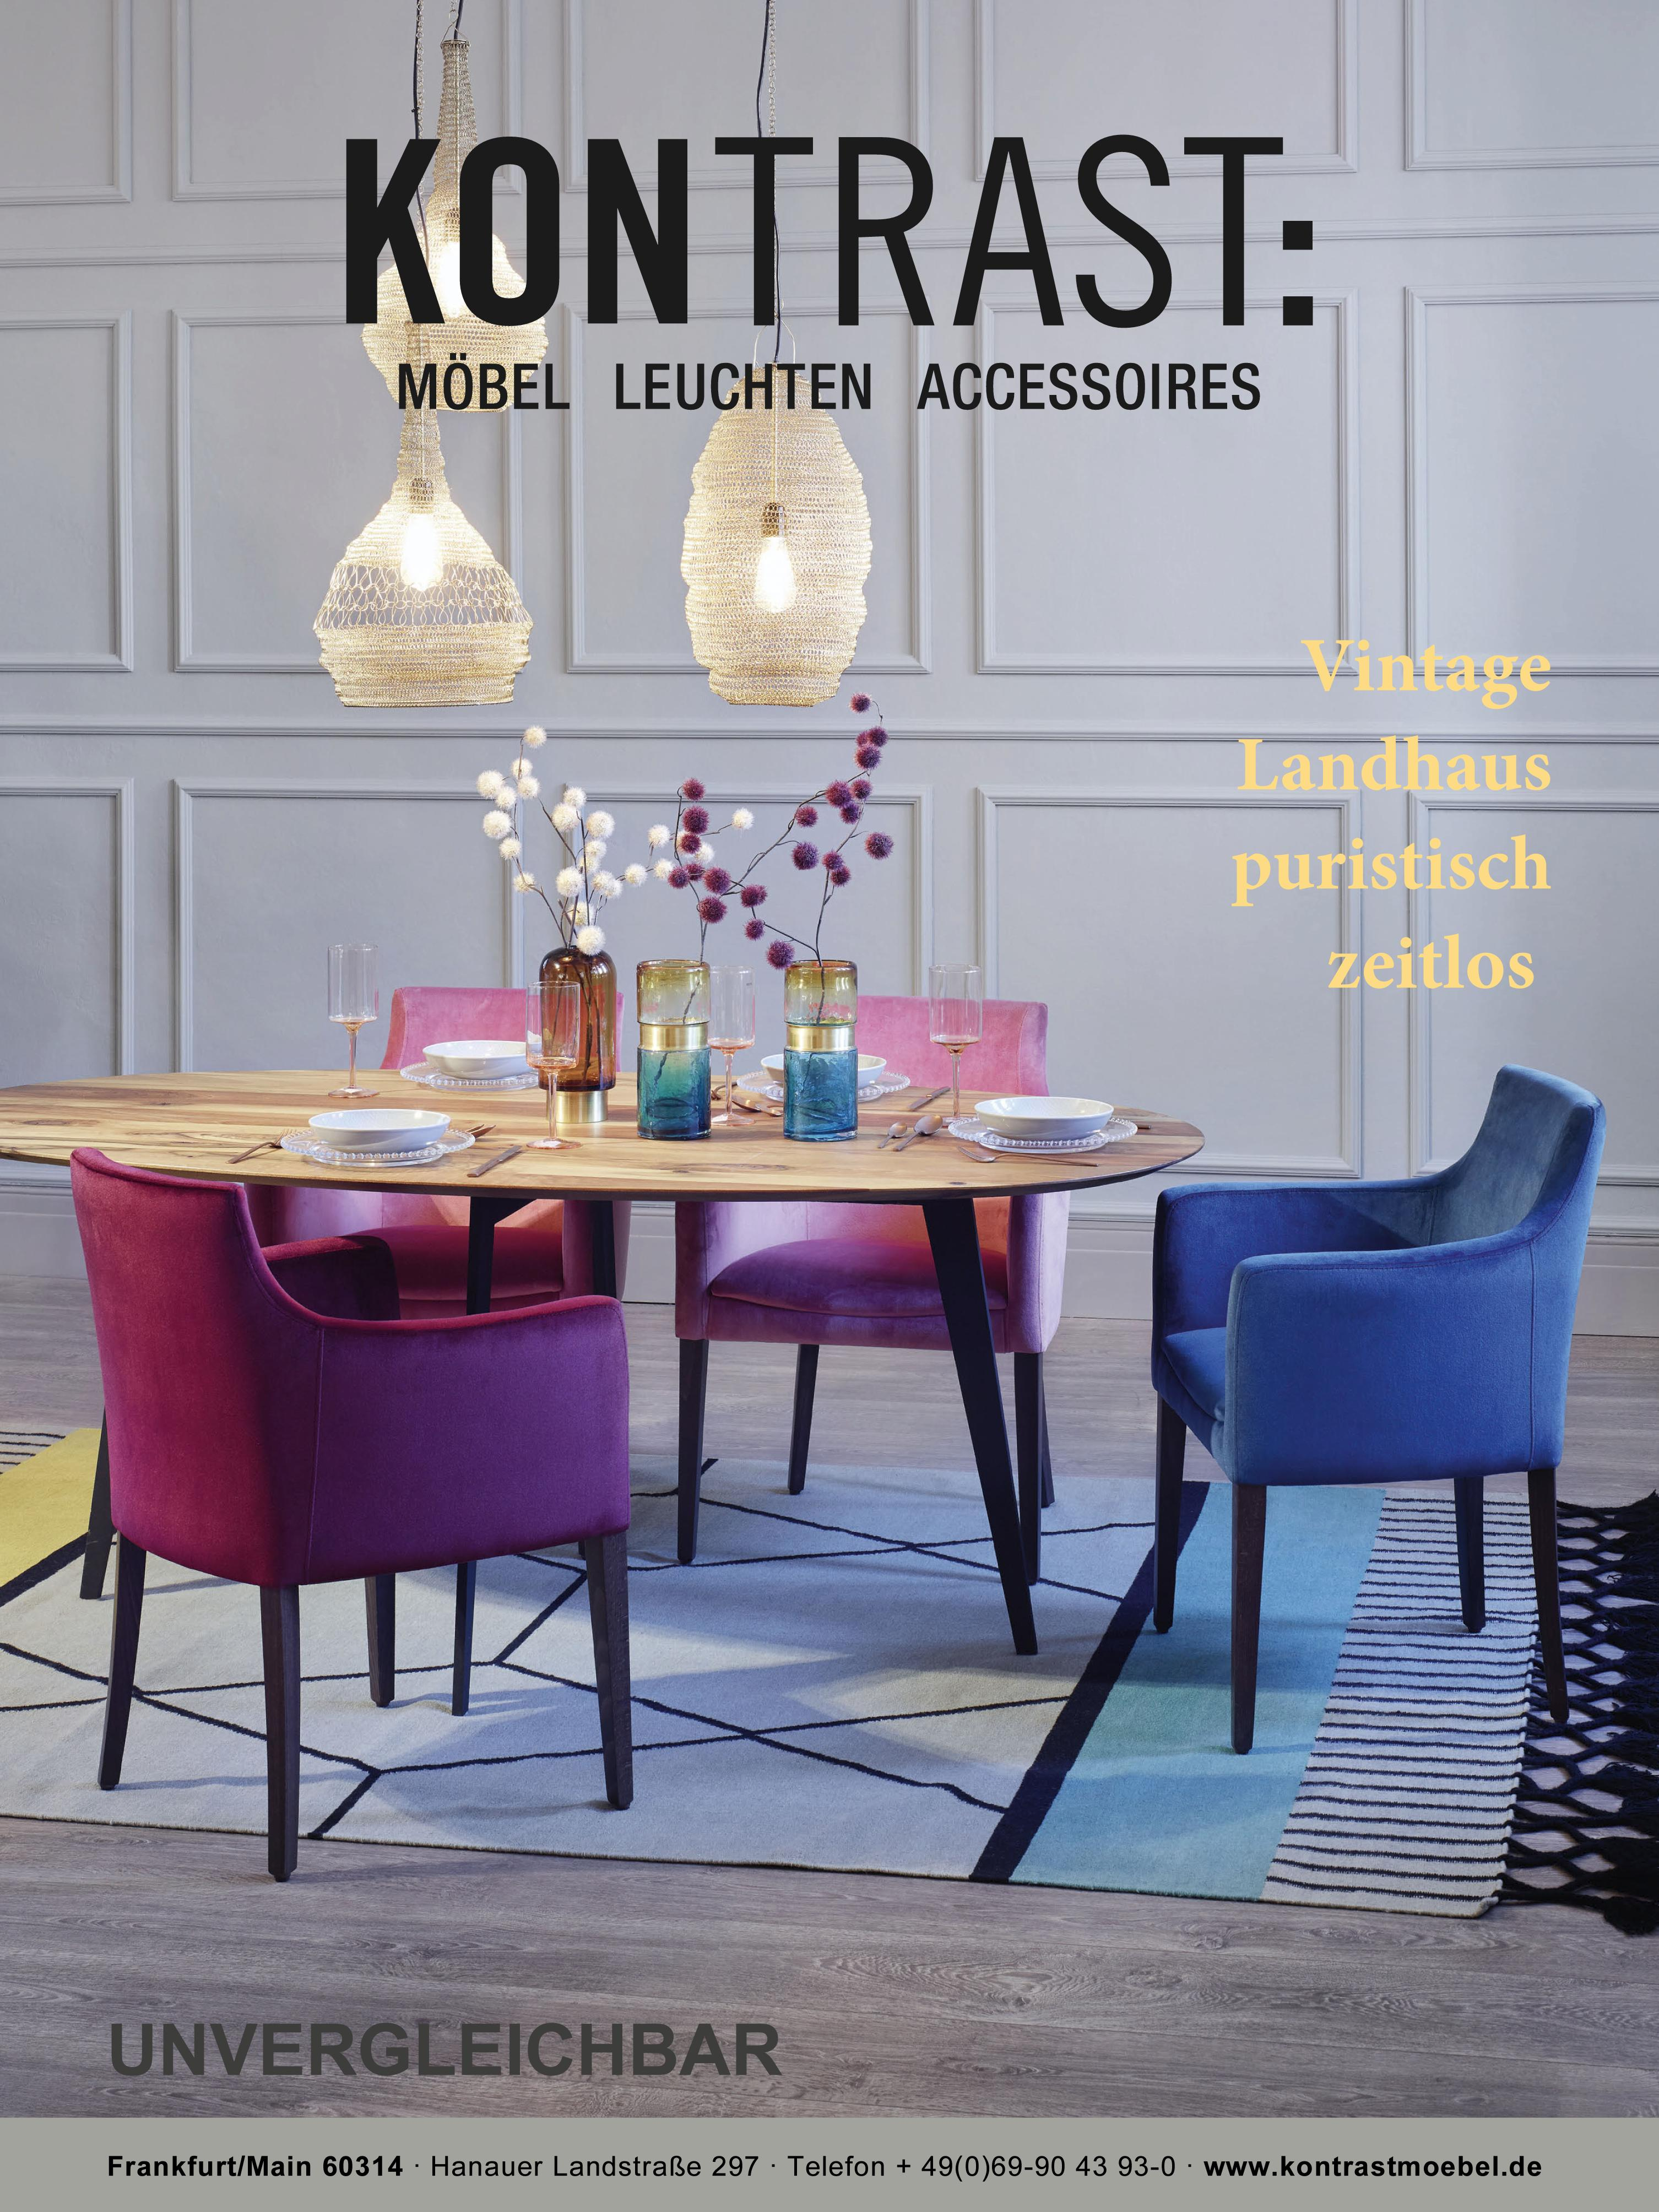 Kontraste Möbel frankfurt kauft ein location kontrast aus dem frankfurt kauft ein